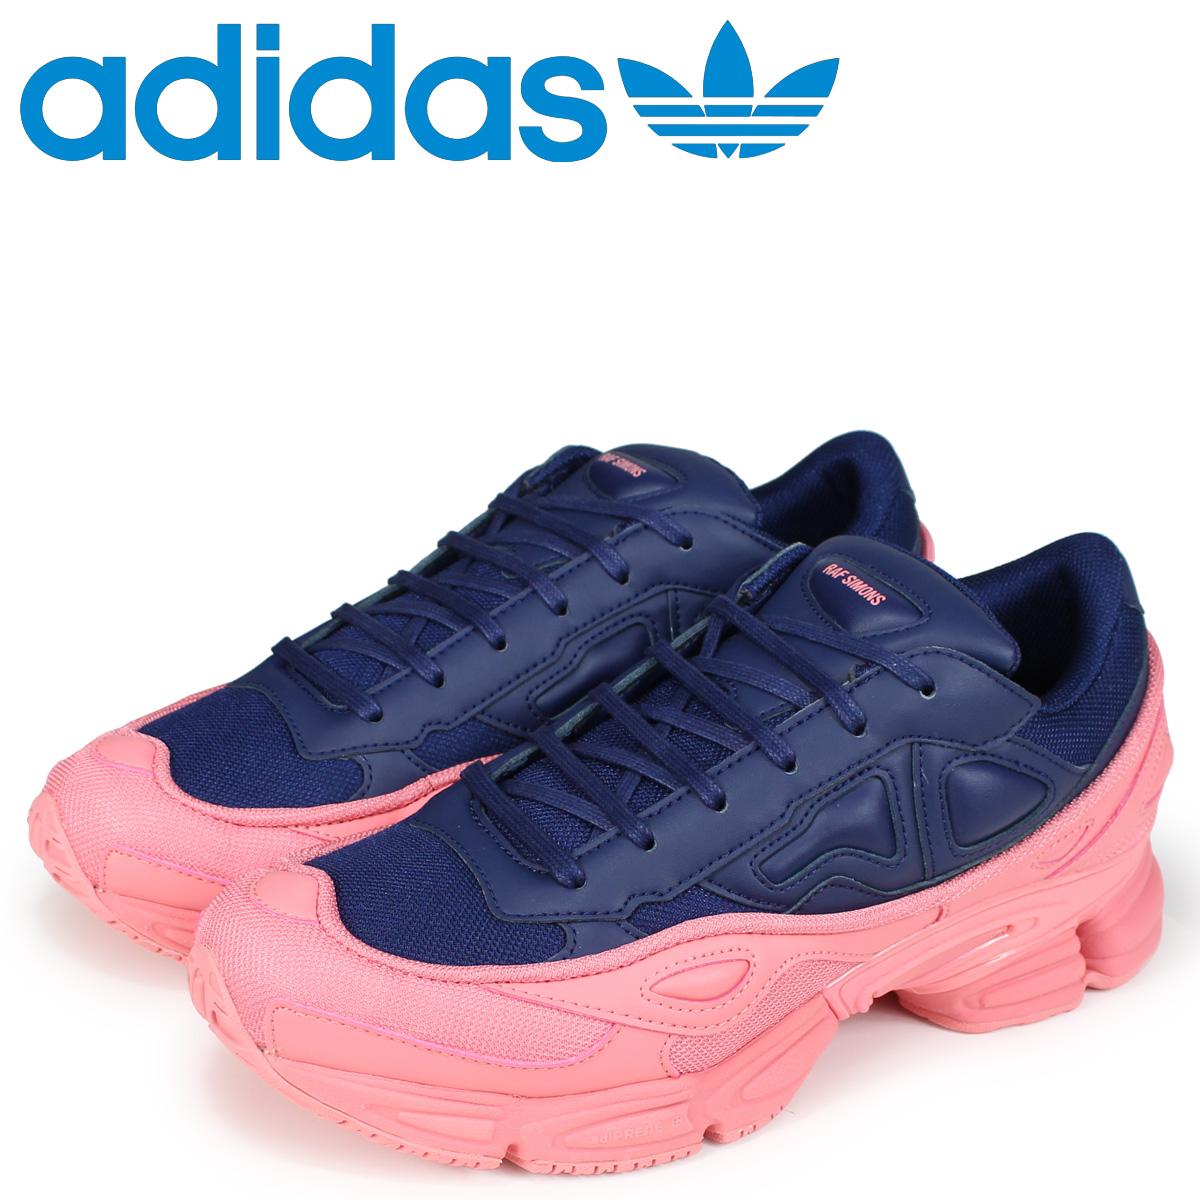 new products 04c64 e800a adidas Originals rough Simmons Adidas originals sneakers RAF SIMONS オズウィーゴー  RSOZWEEGO men F34268 pink